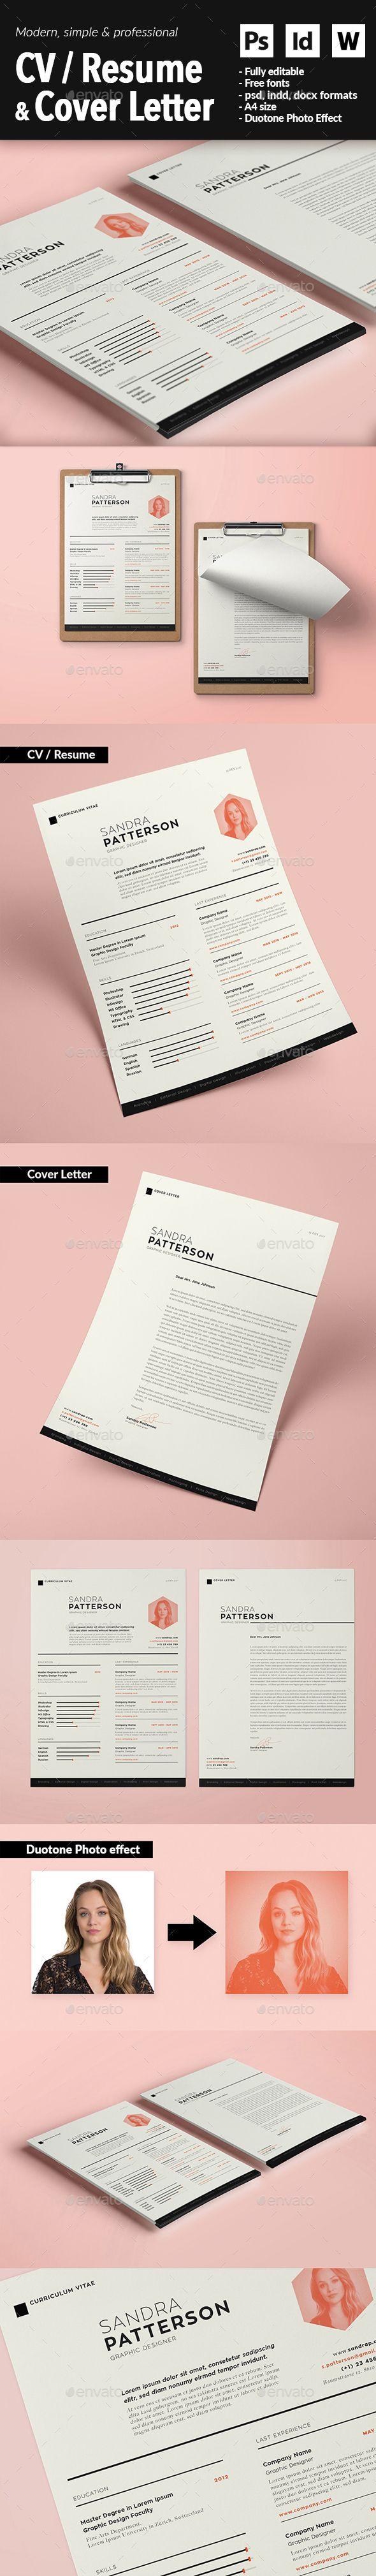 CV / Resume & Cover Letter #word #cover letter  • Download here → https://graphicriver.net/item/cv-resume-cover-letter/20597852?ref=pxcr